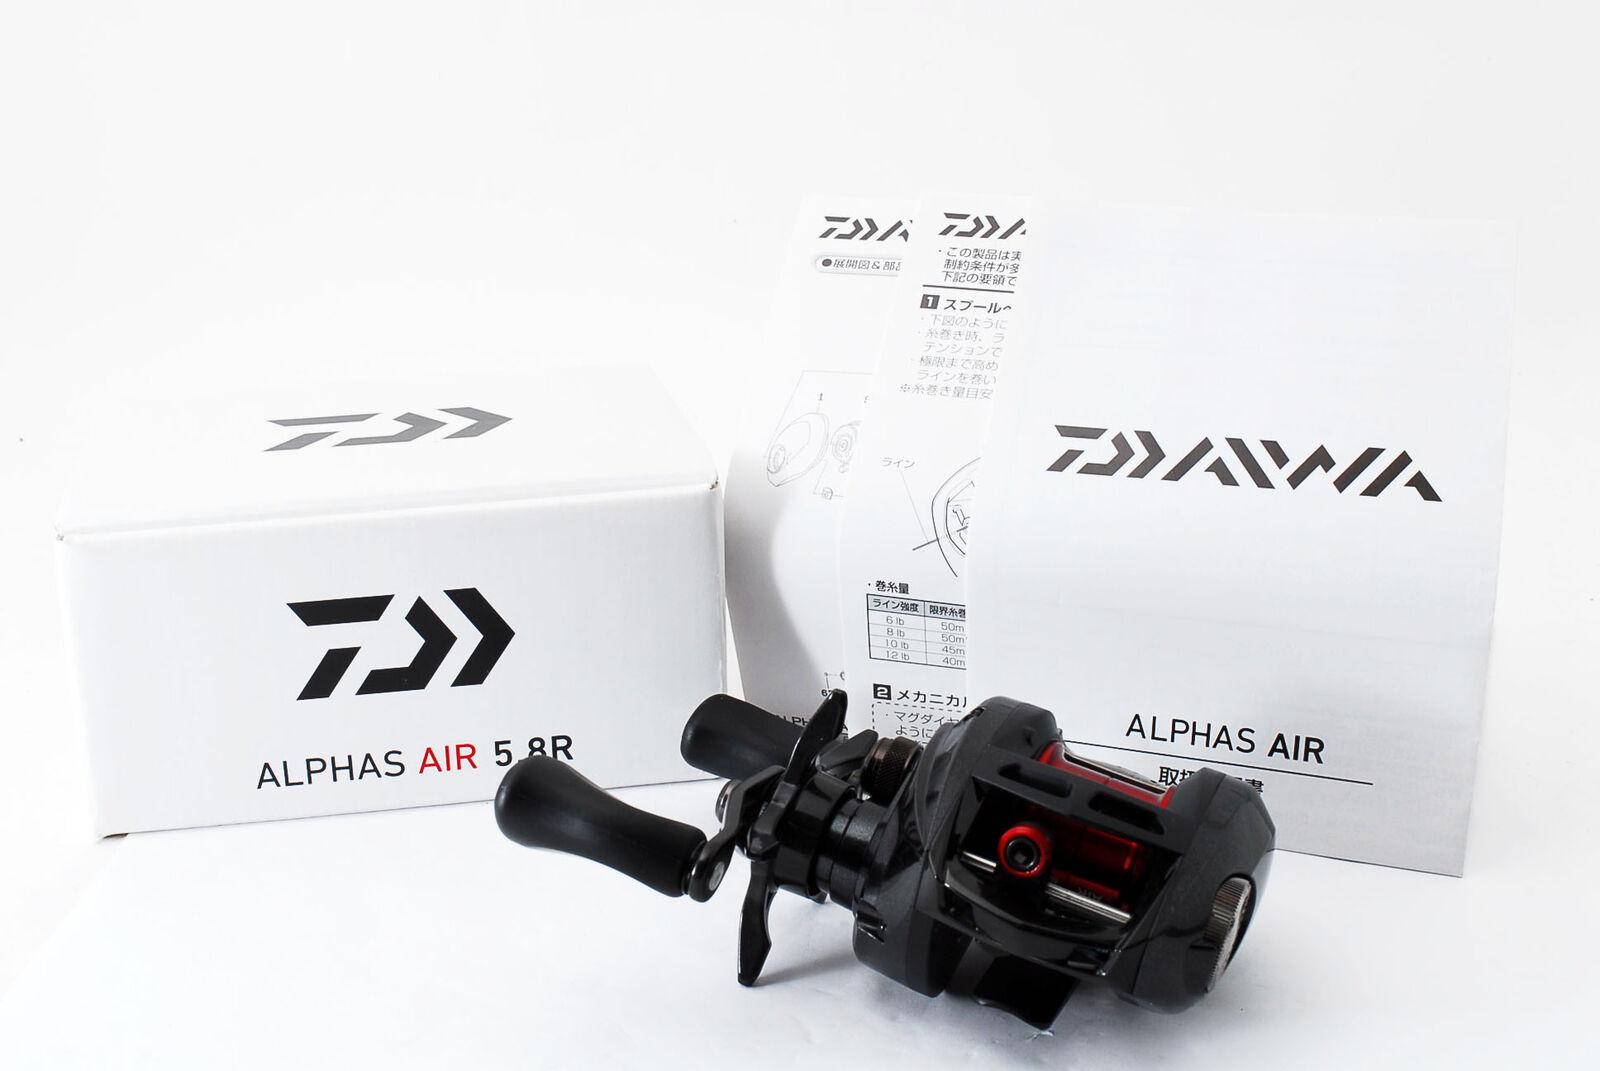 Nuevo [] Daiwa alfas Air 5.8R diestros Baitcasting Reel  932